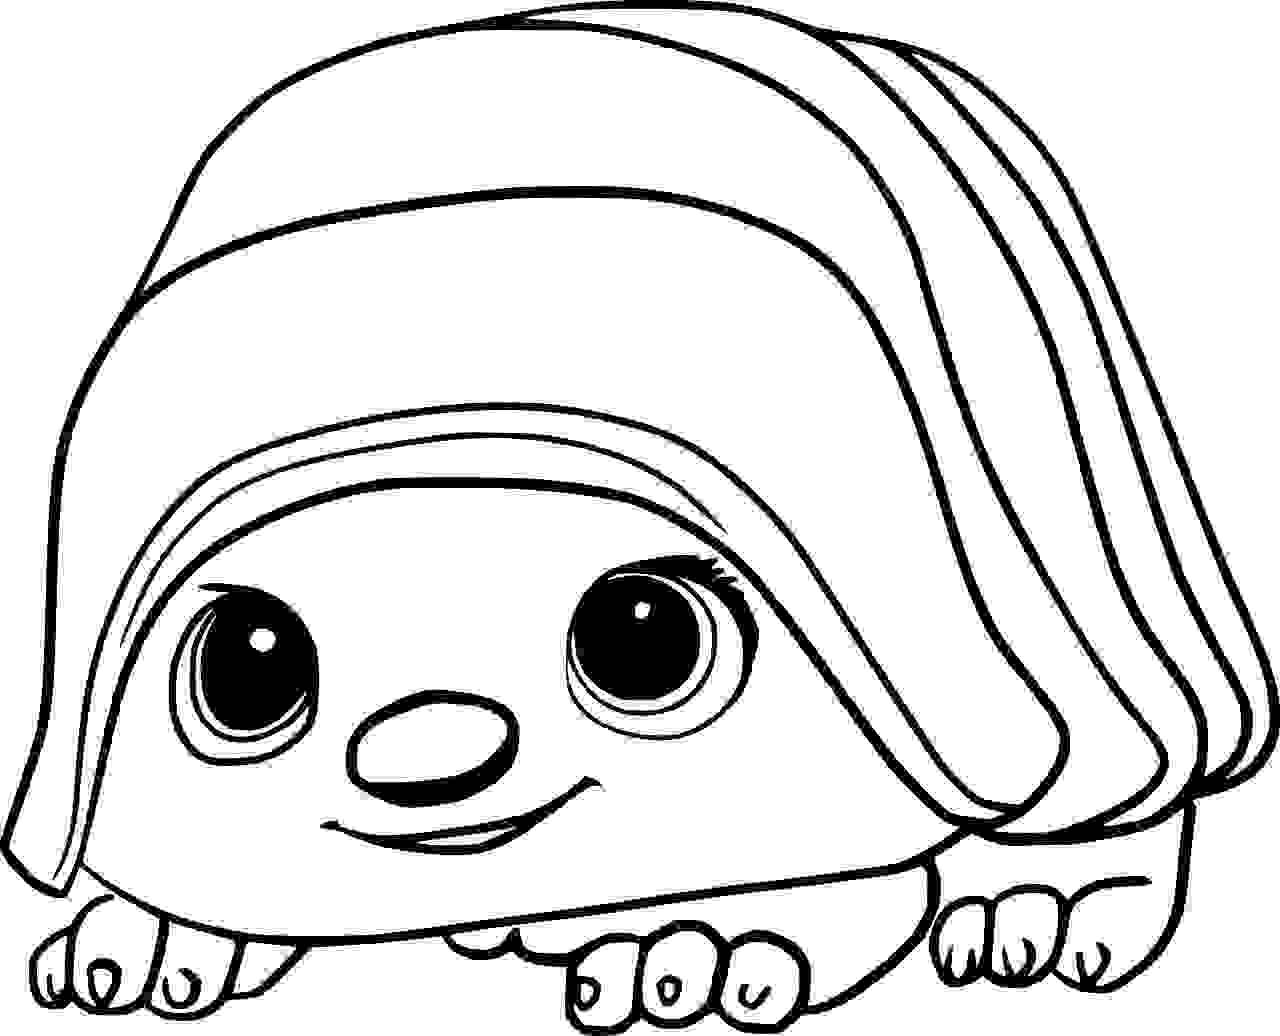 A pug hybrid Tuk Tuk Coloring Page